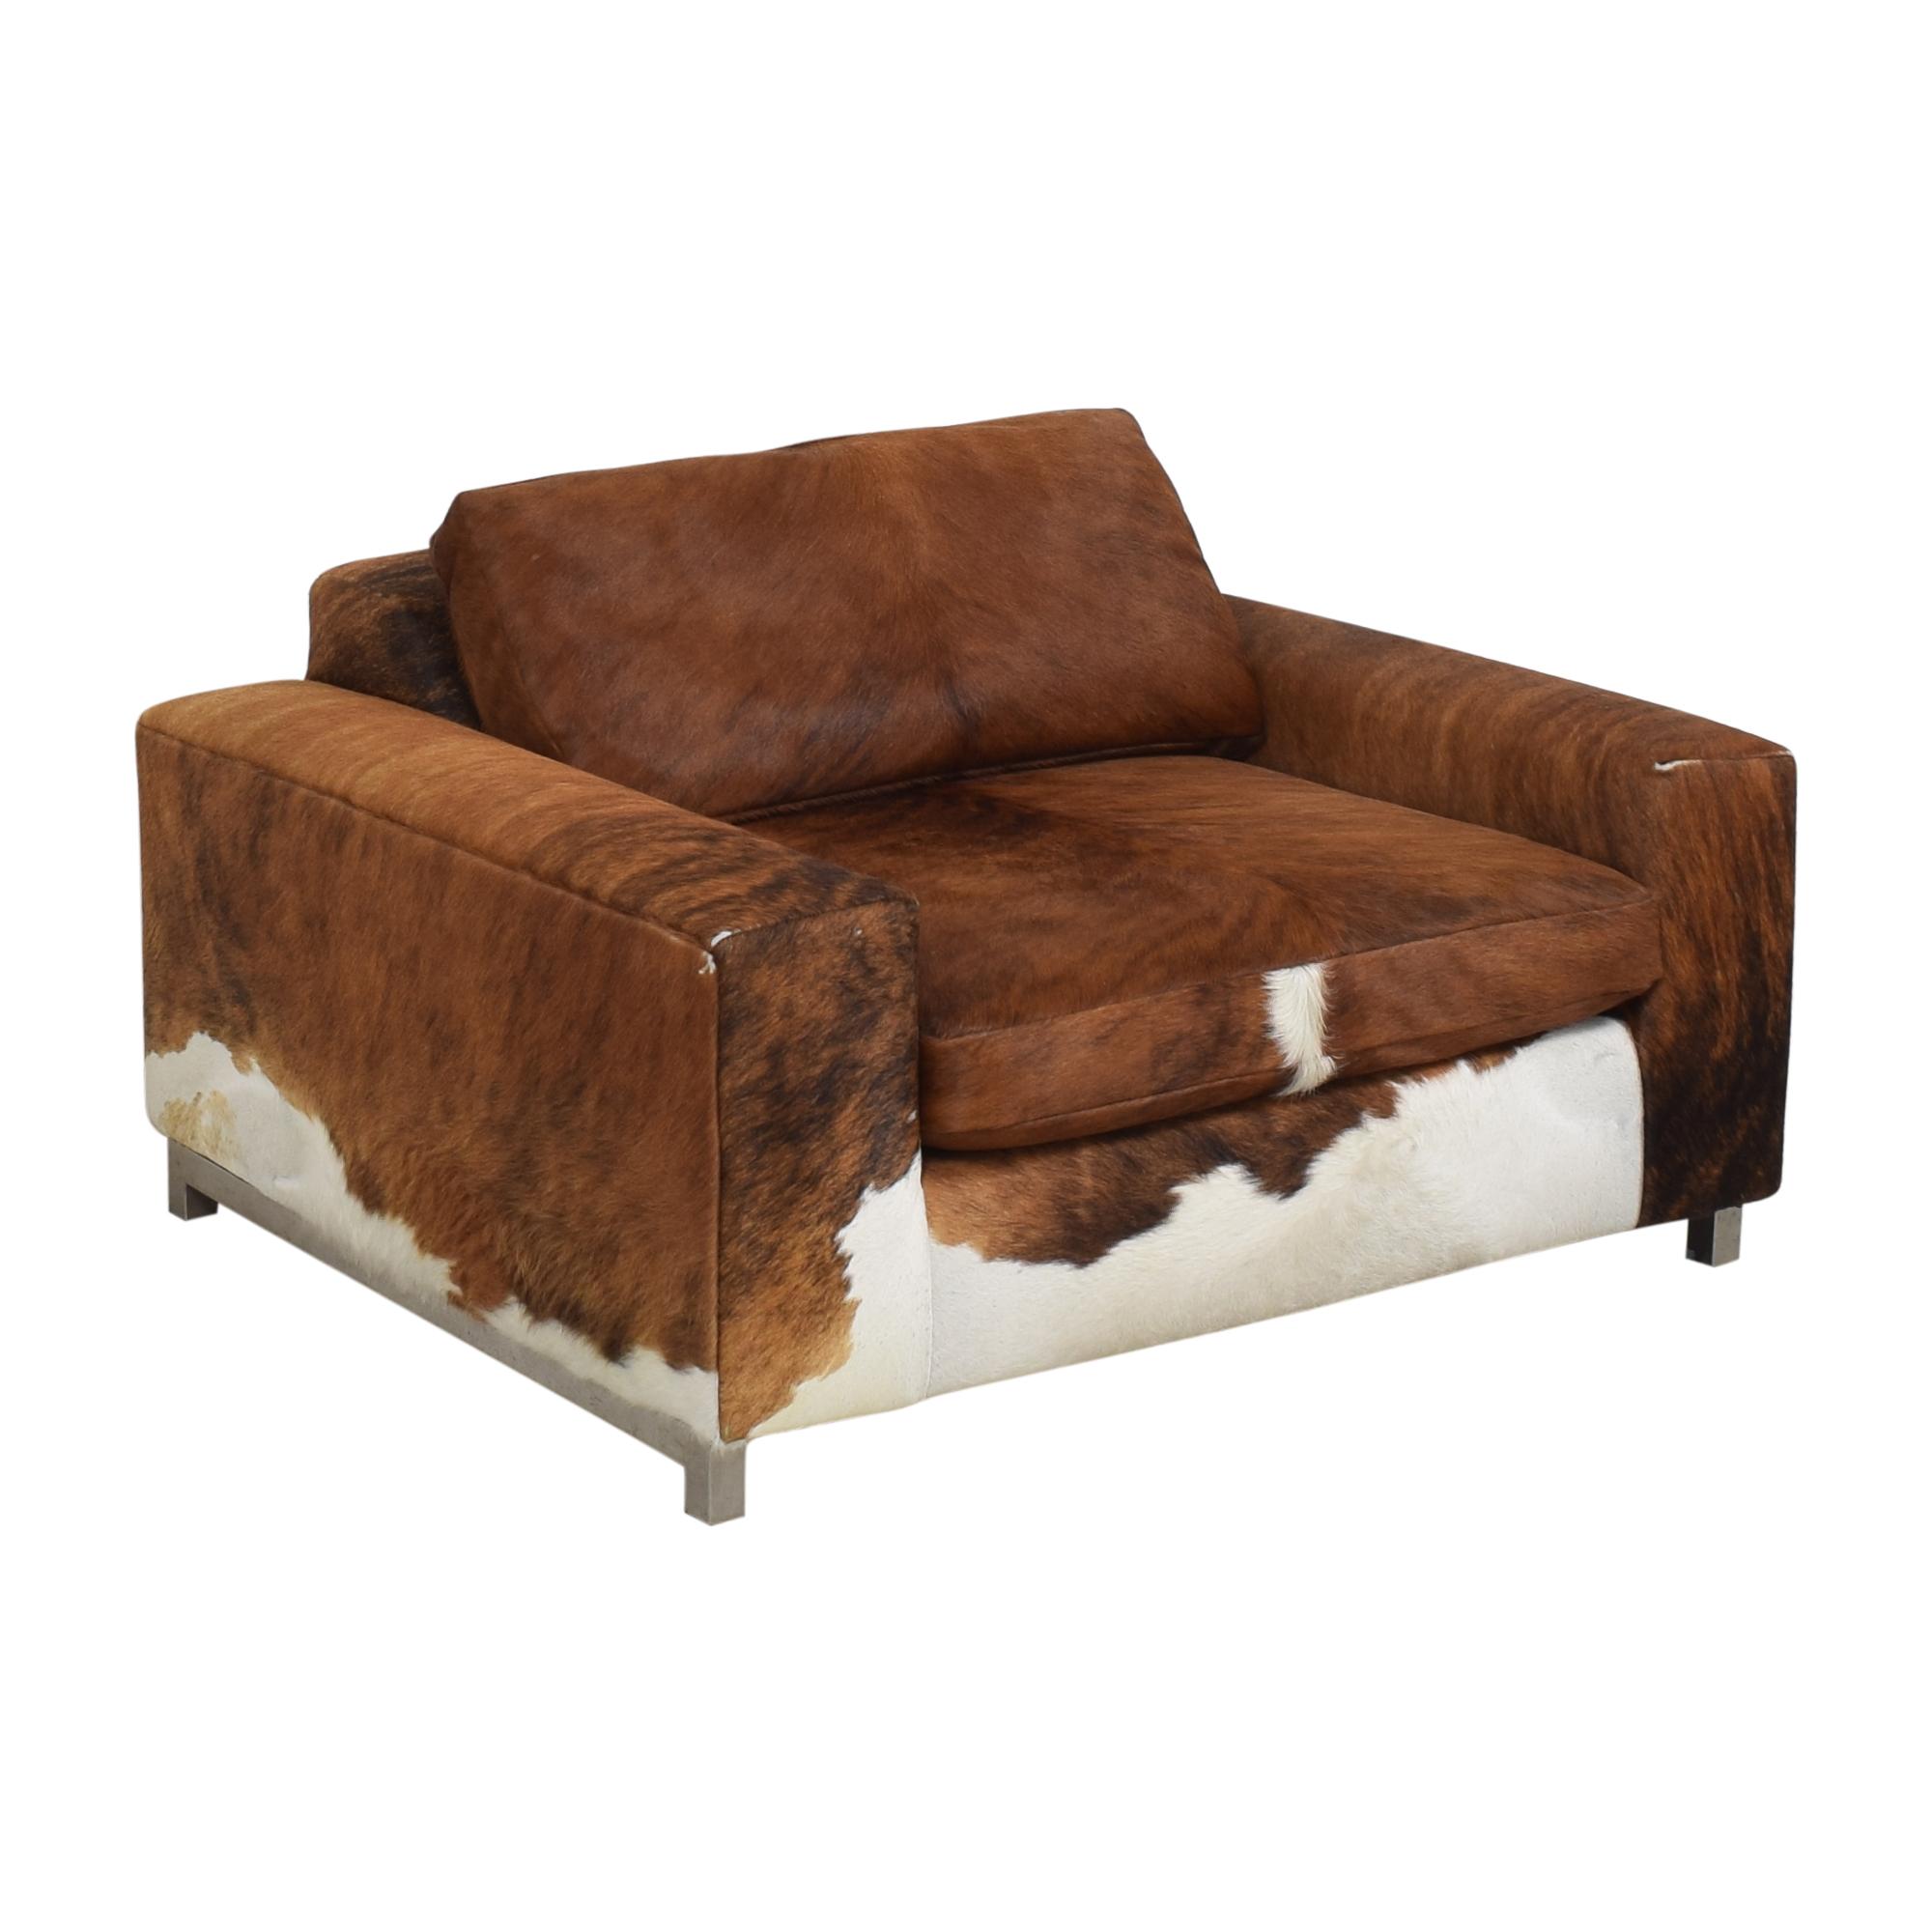 Room & Board Custom Room & Board Hide Lounge Chair discount